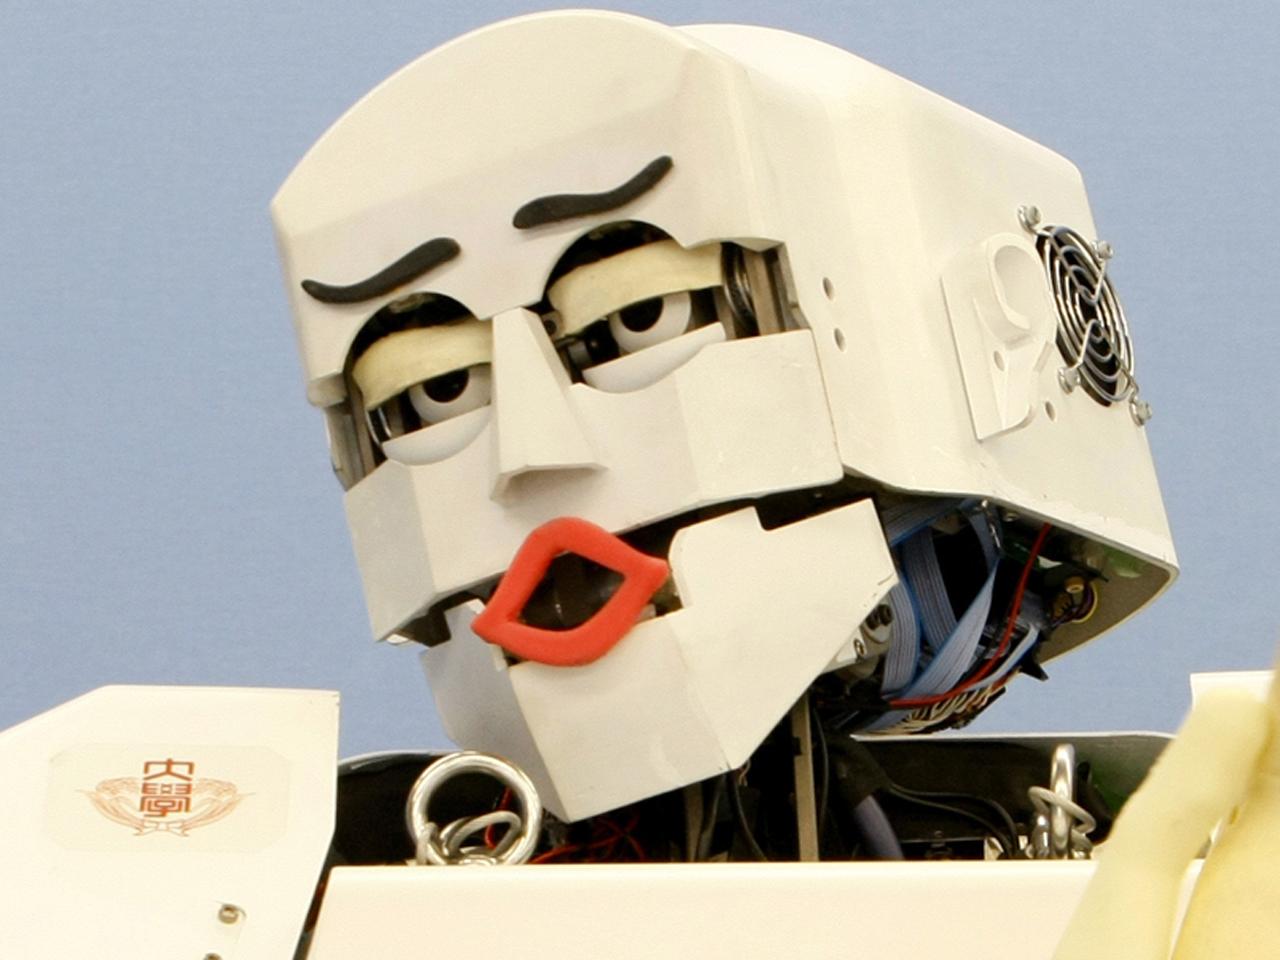 Humanoid robot KOBIAN shows emotional display of